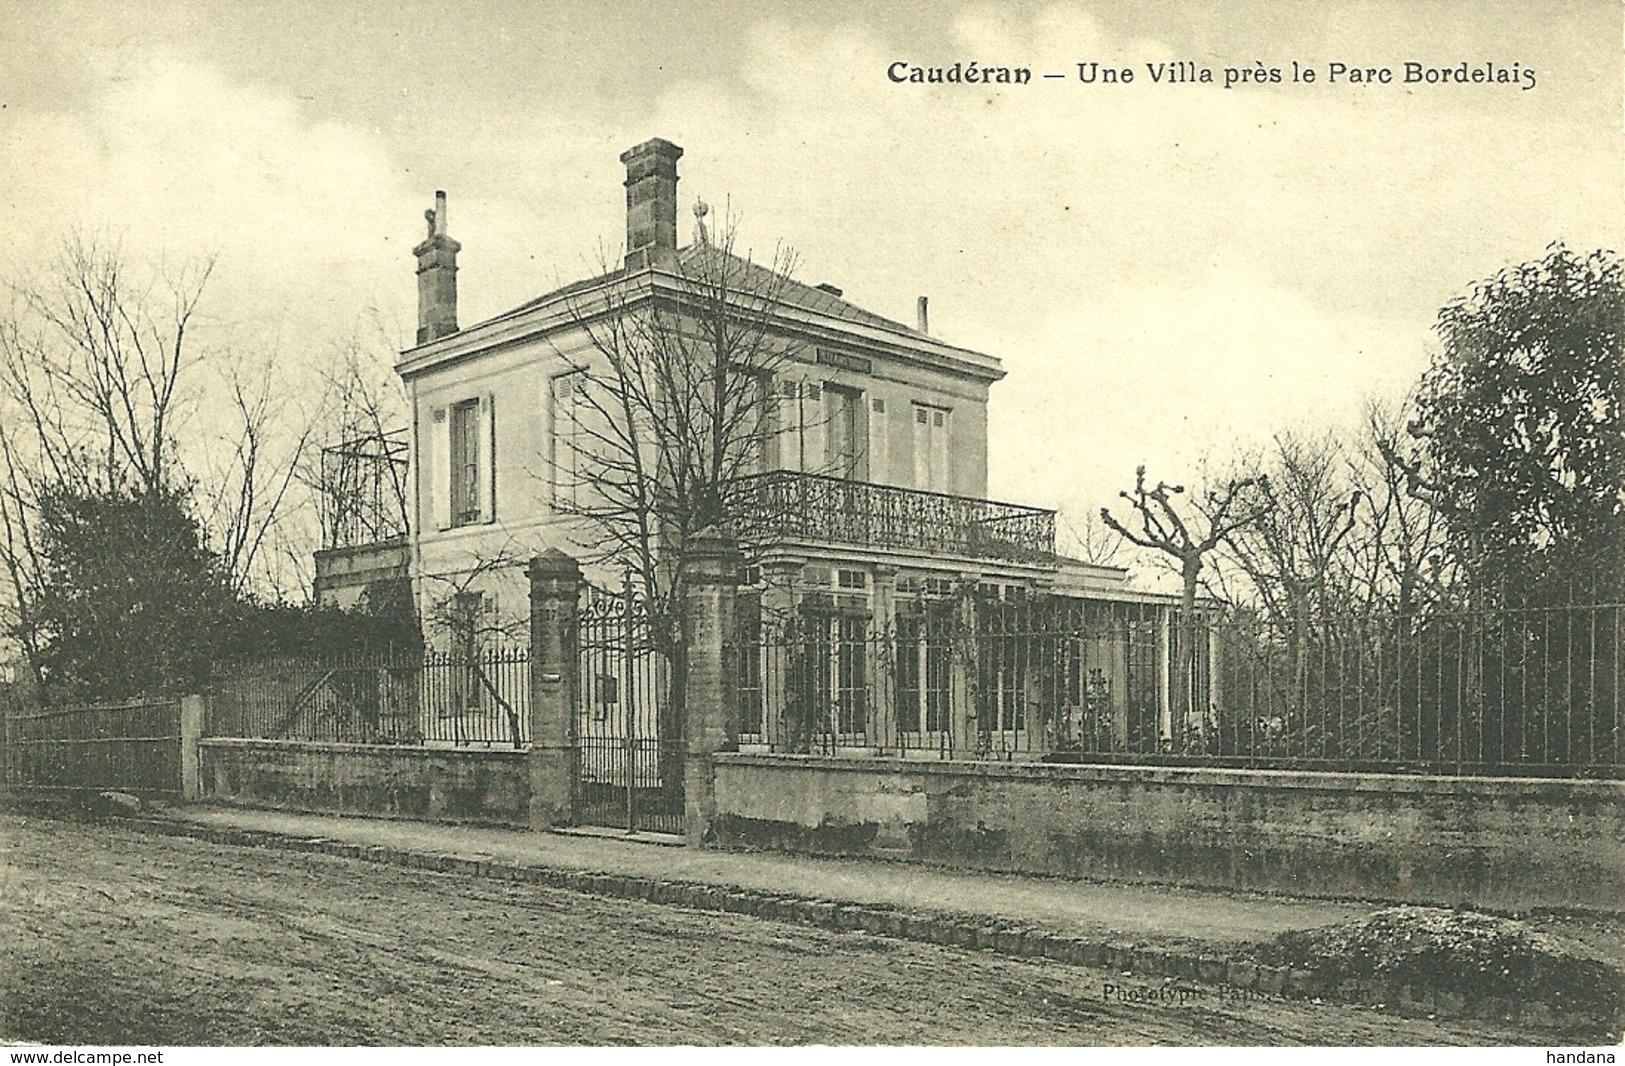 33 GIRONDE BORDEAUX CAUDERAN VILLA PRES PARC BORDELAIS  1906 JOLI PLAN A VOIR - Bordeaux